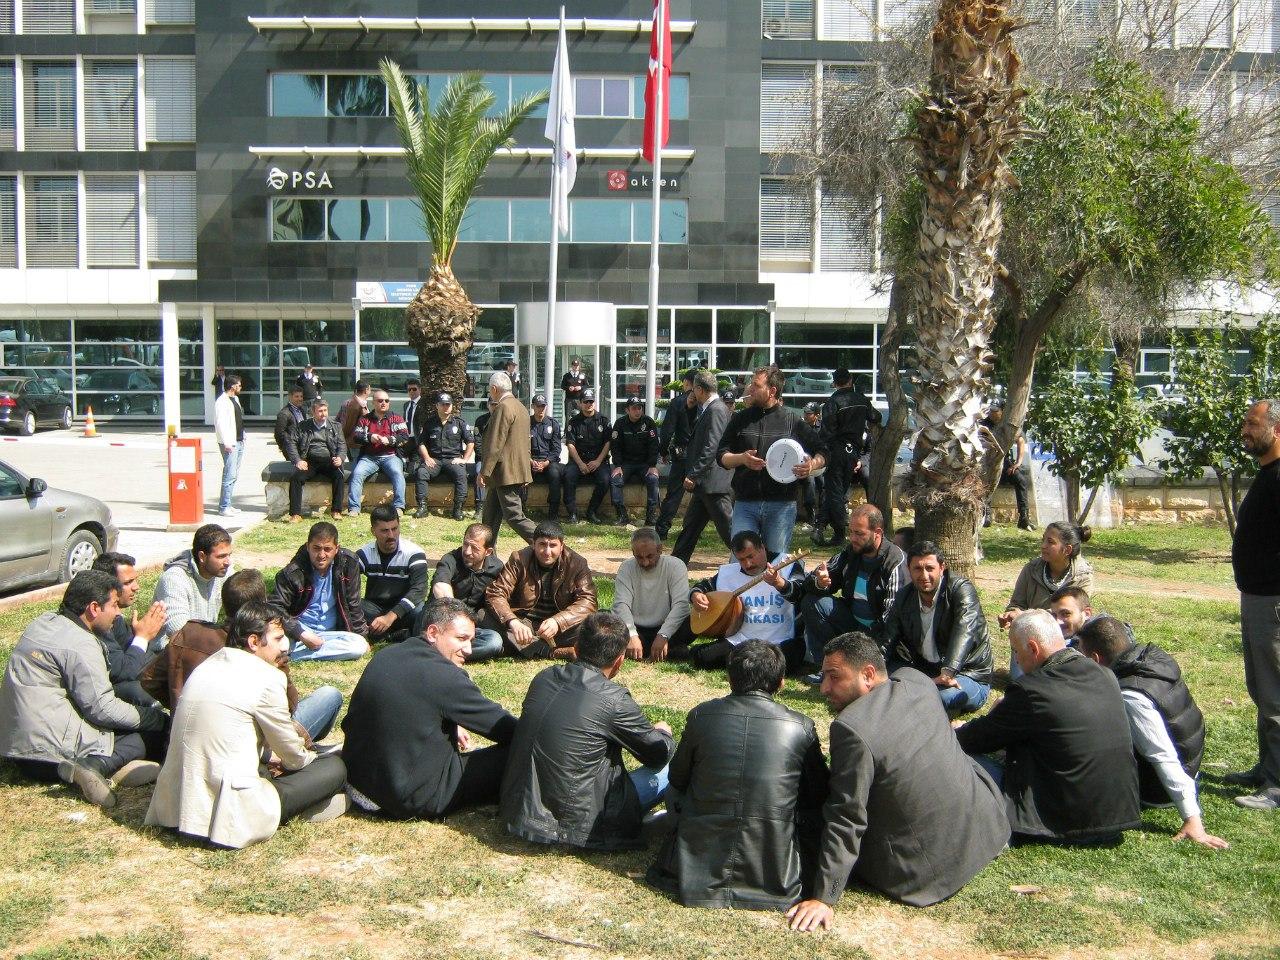 сотрудники порта в Турции протестуют